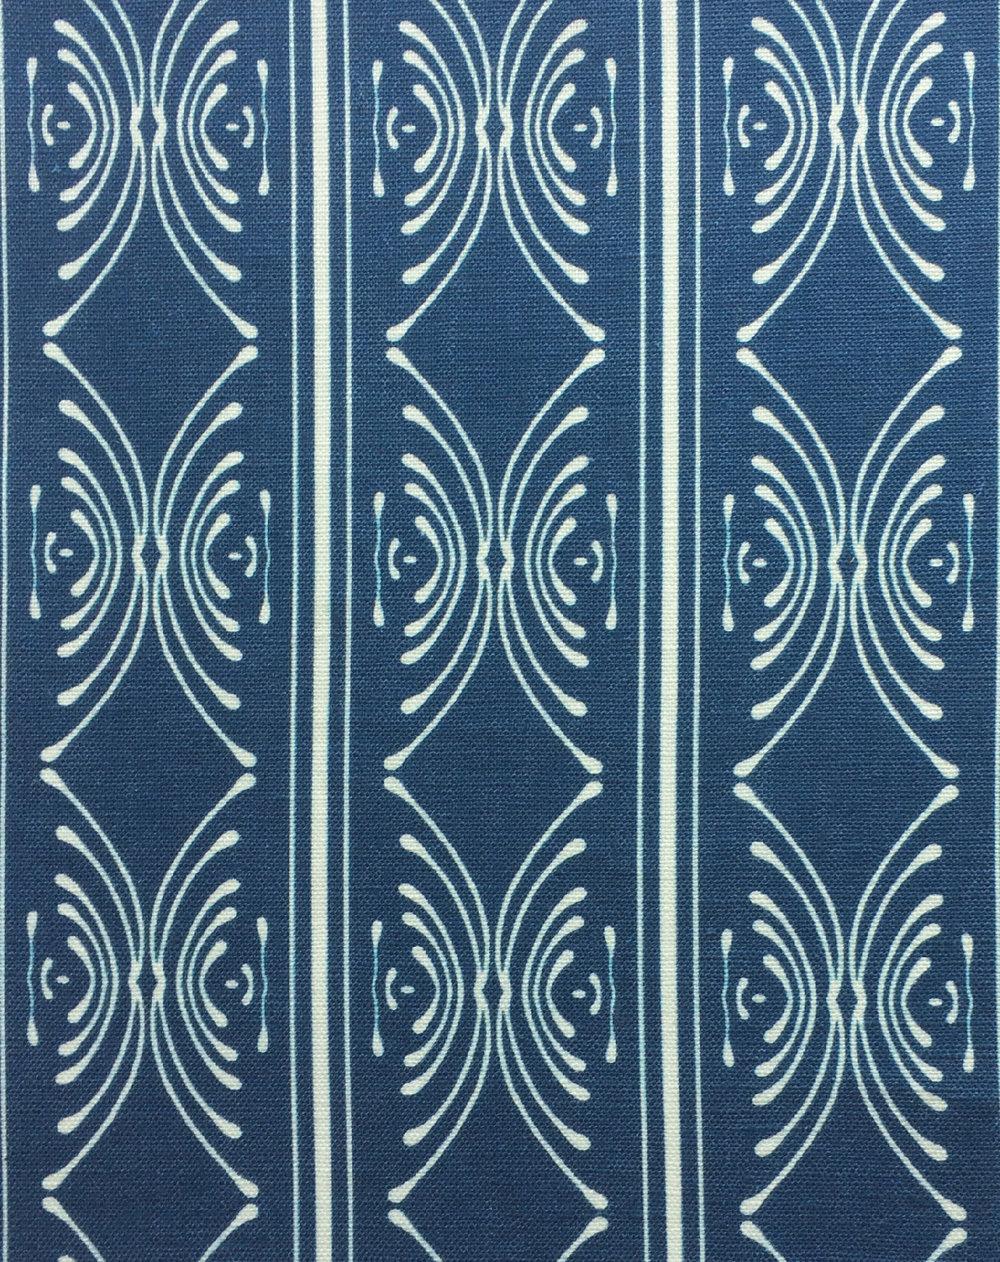 Small Kris Kross: Blue